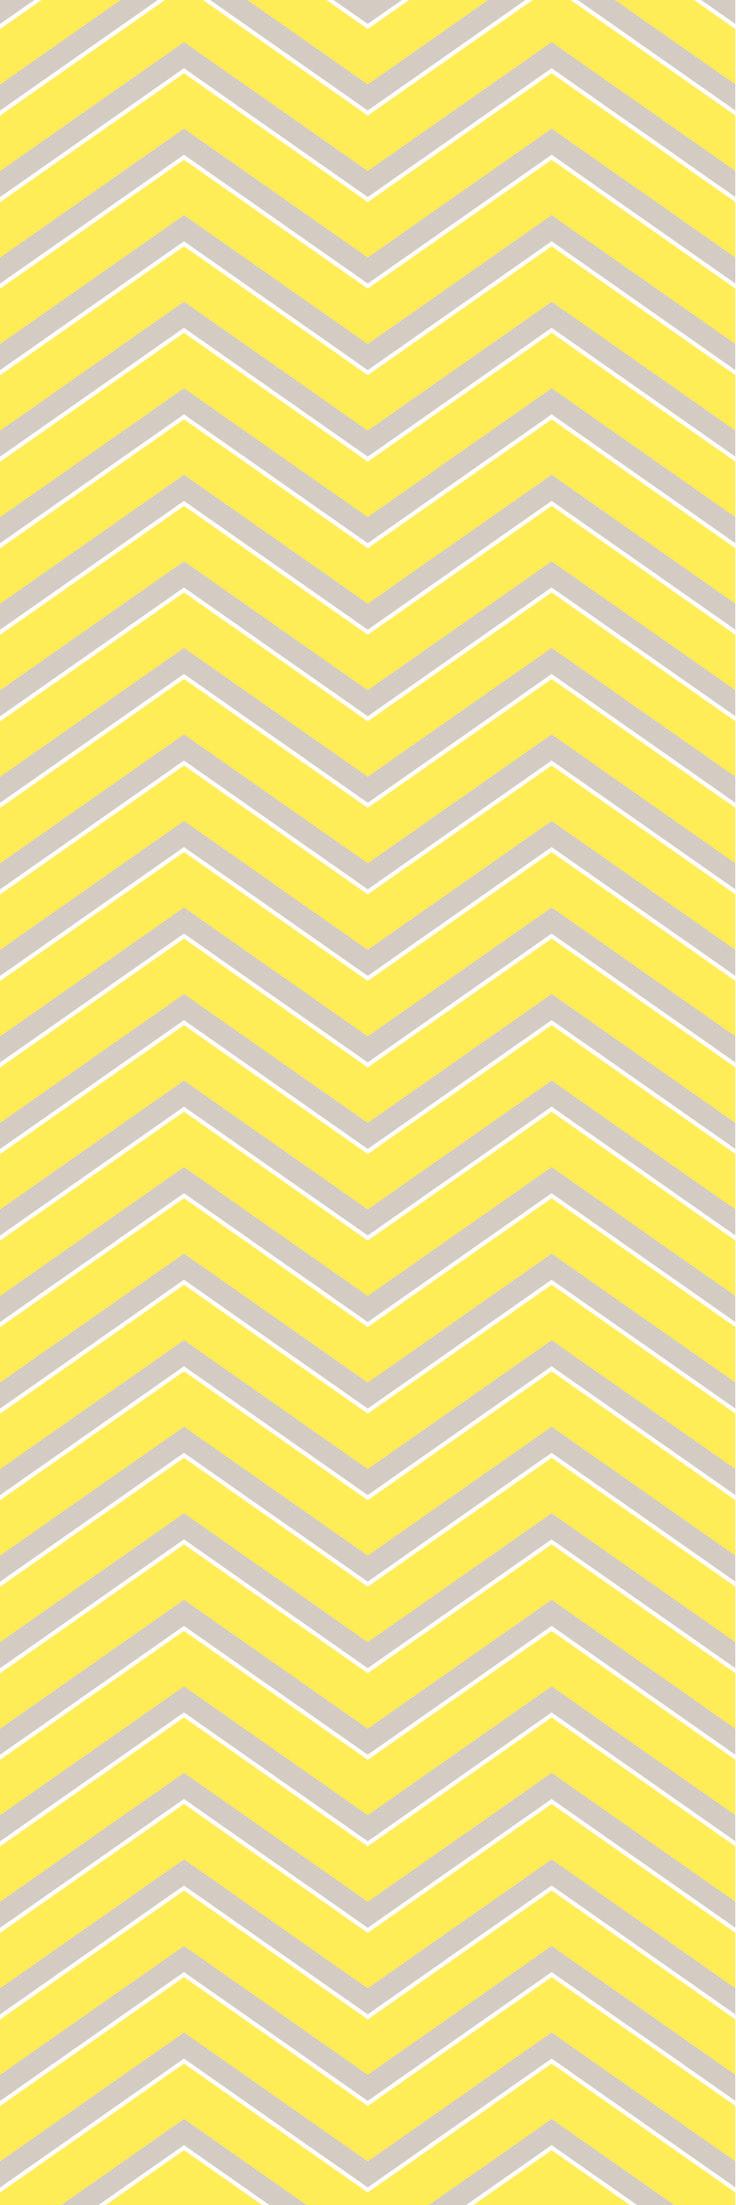 Custom printed Chevron wallpaper from the 'DUCKLING' colour range #chevron #wallpaper #muurgraphics